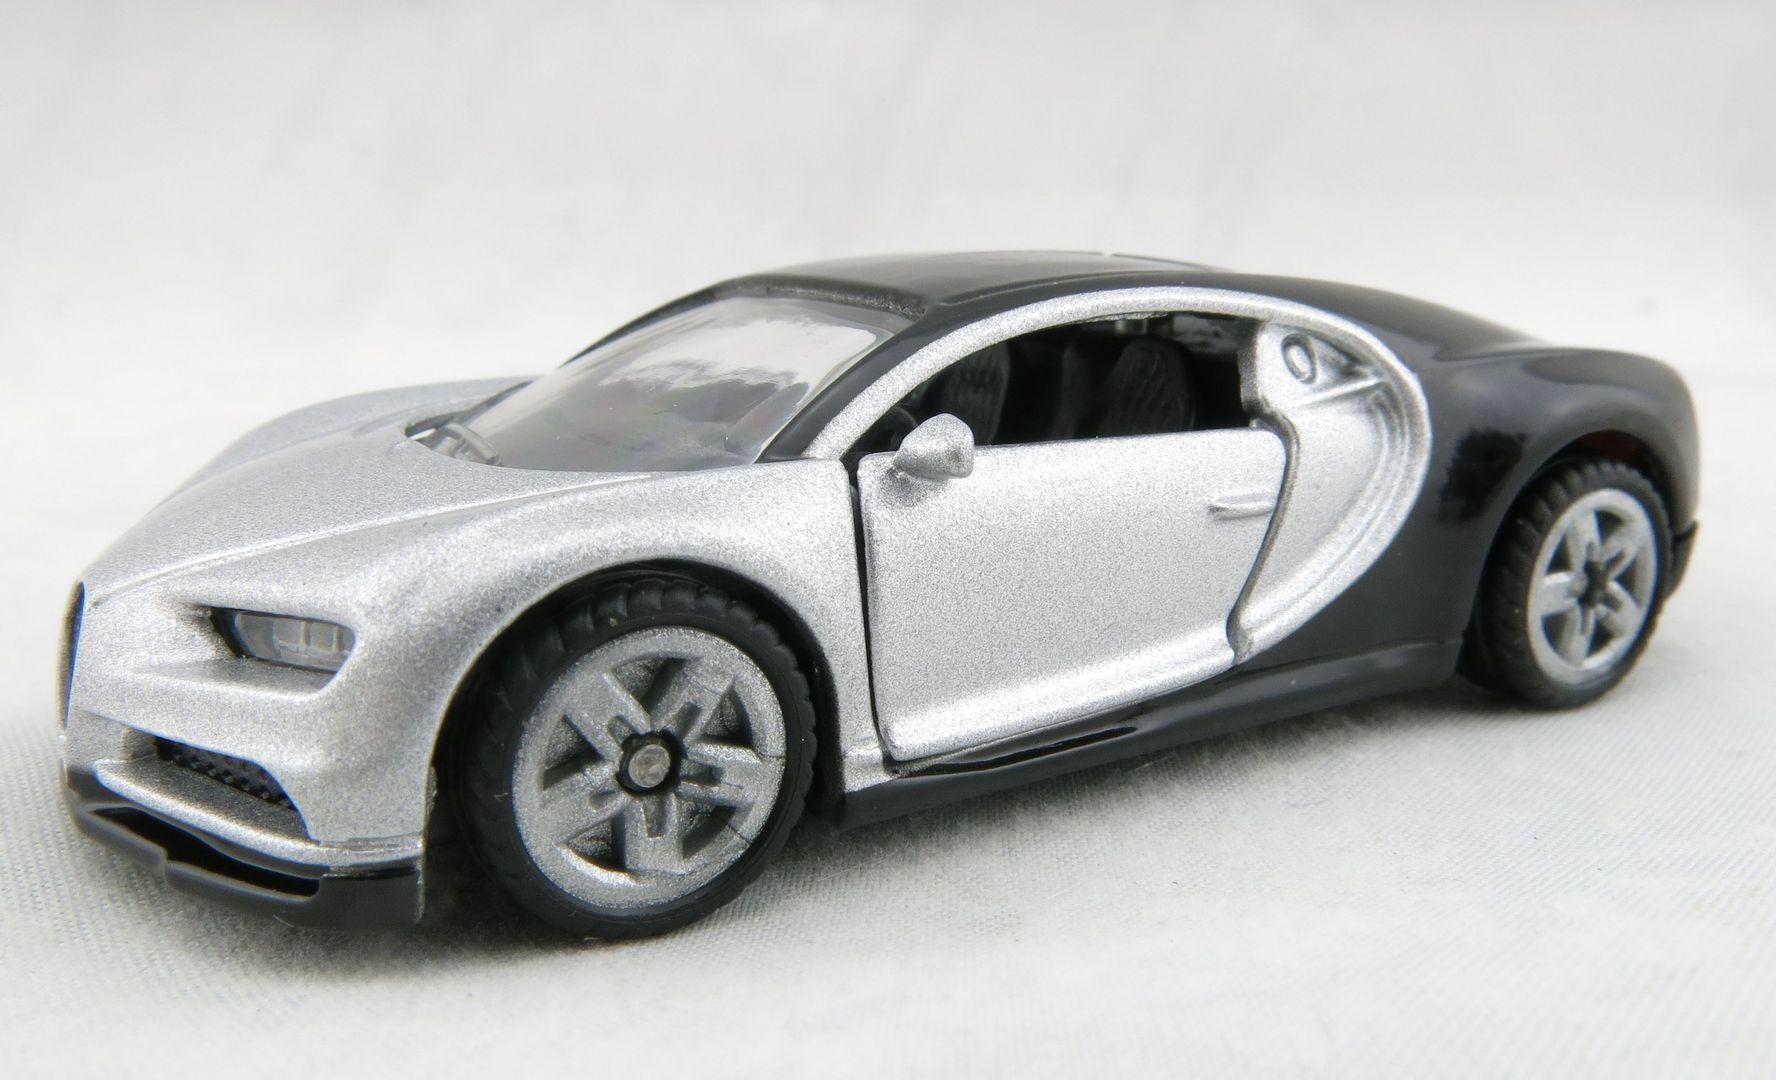 siku 1508 bugatti chiron sports car diecast new release 2018 ebay. Black Bedroom Furniture Sets. Home Design Ideas